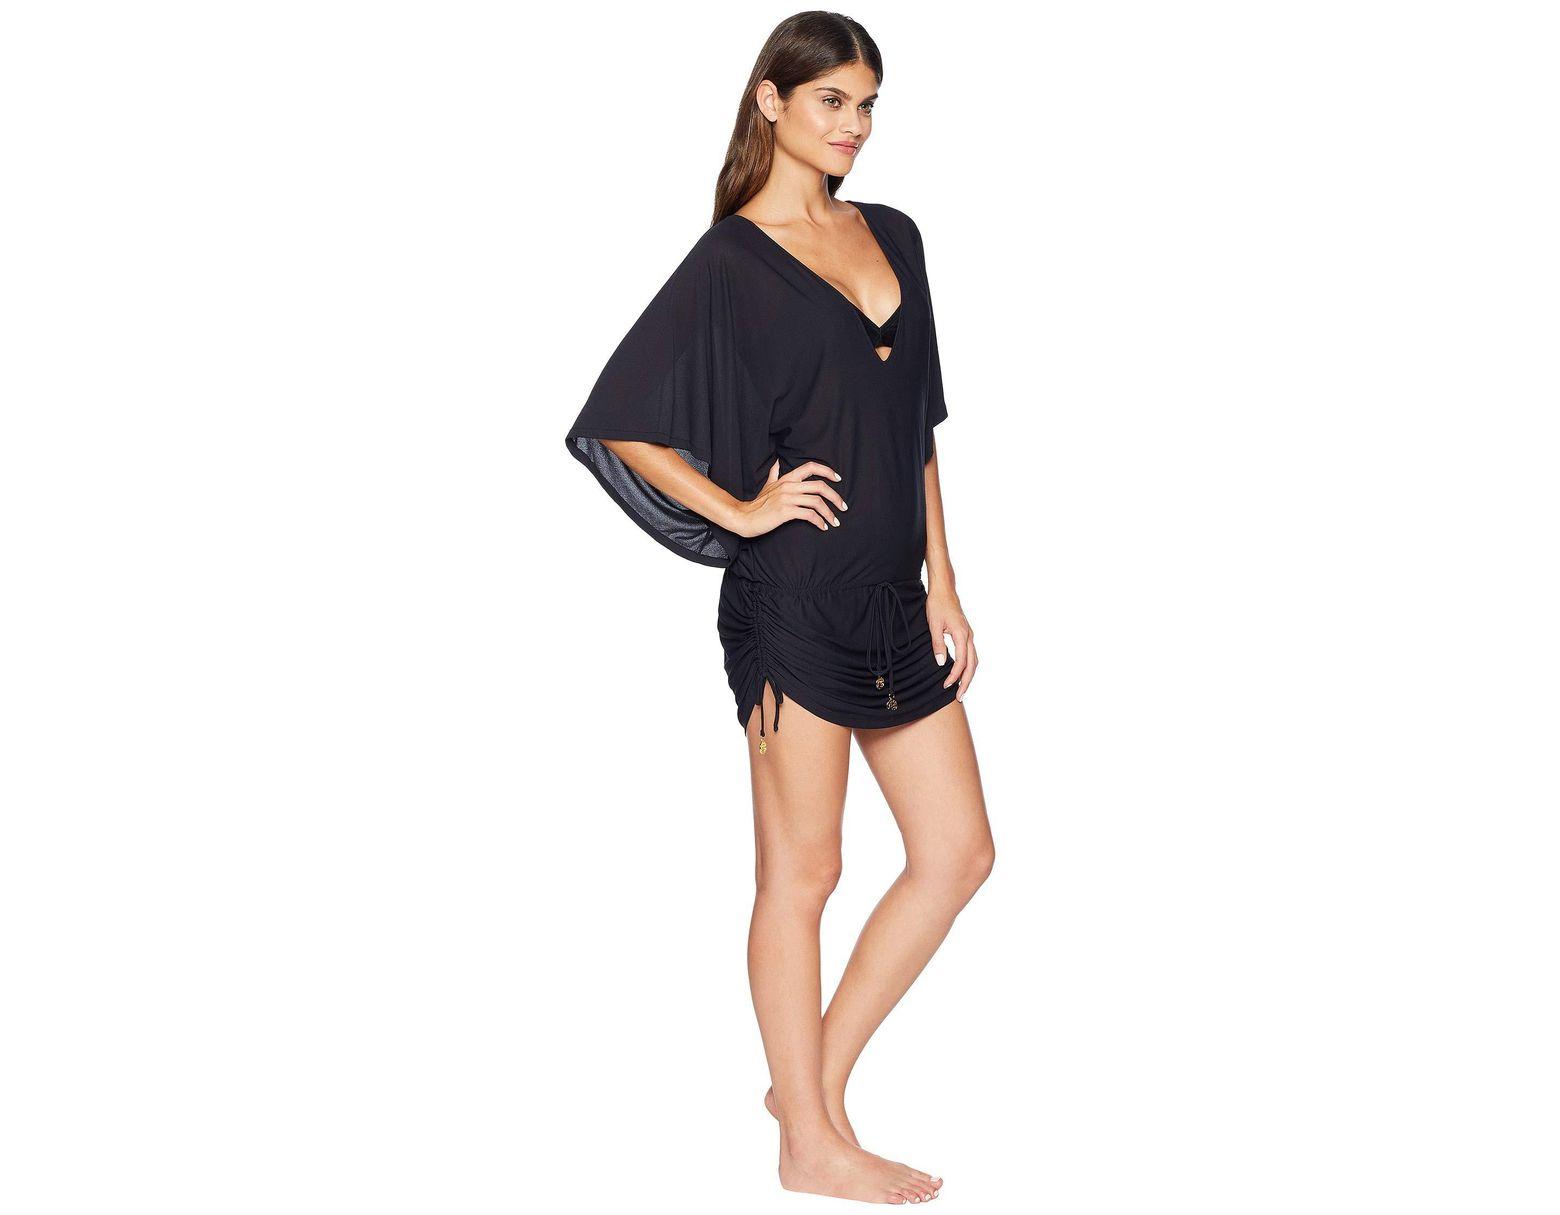 7cae38bbef Lyst - Luli Fama Cosita Buena Cabana V-neck Dress Cover-up (black) Women's  Swimwear in Black